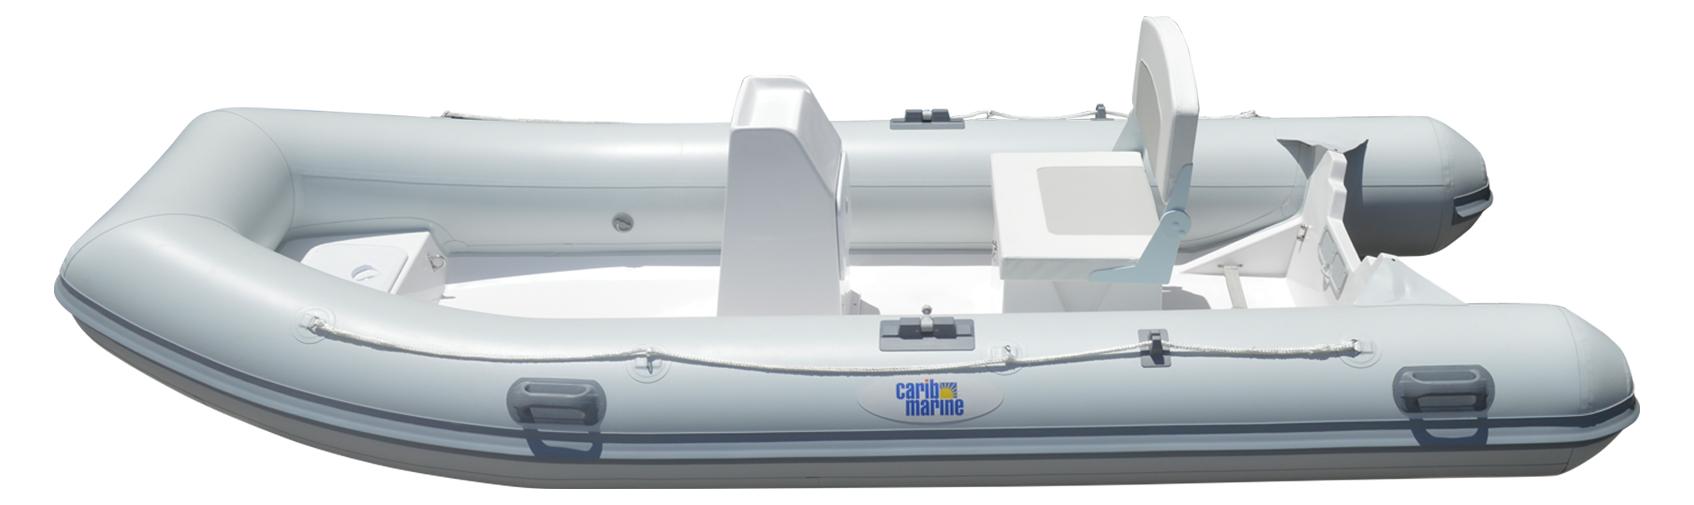 Dinghy, 4.1m 13.5' F'Glass Dbl-Flr w/Console&Seat 4